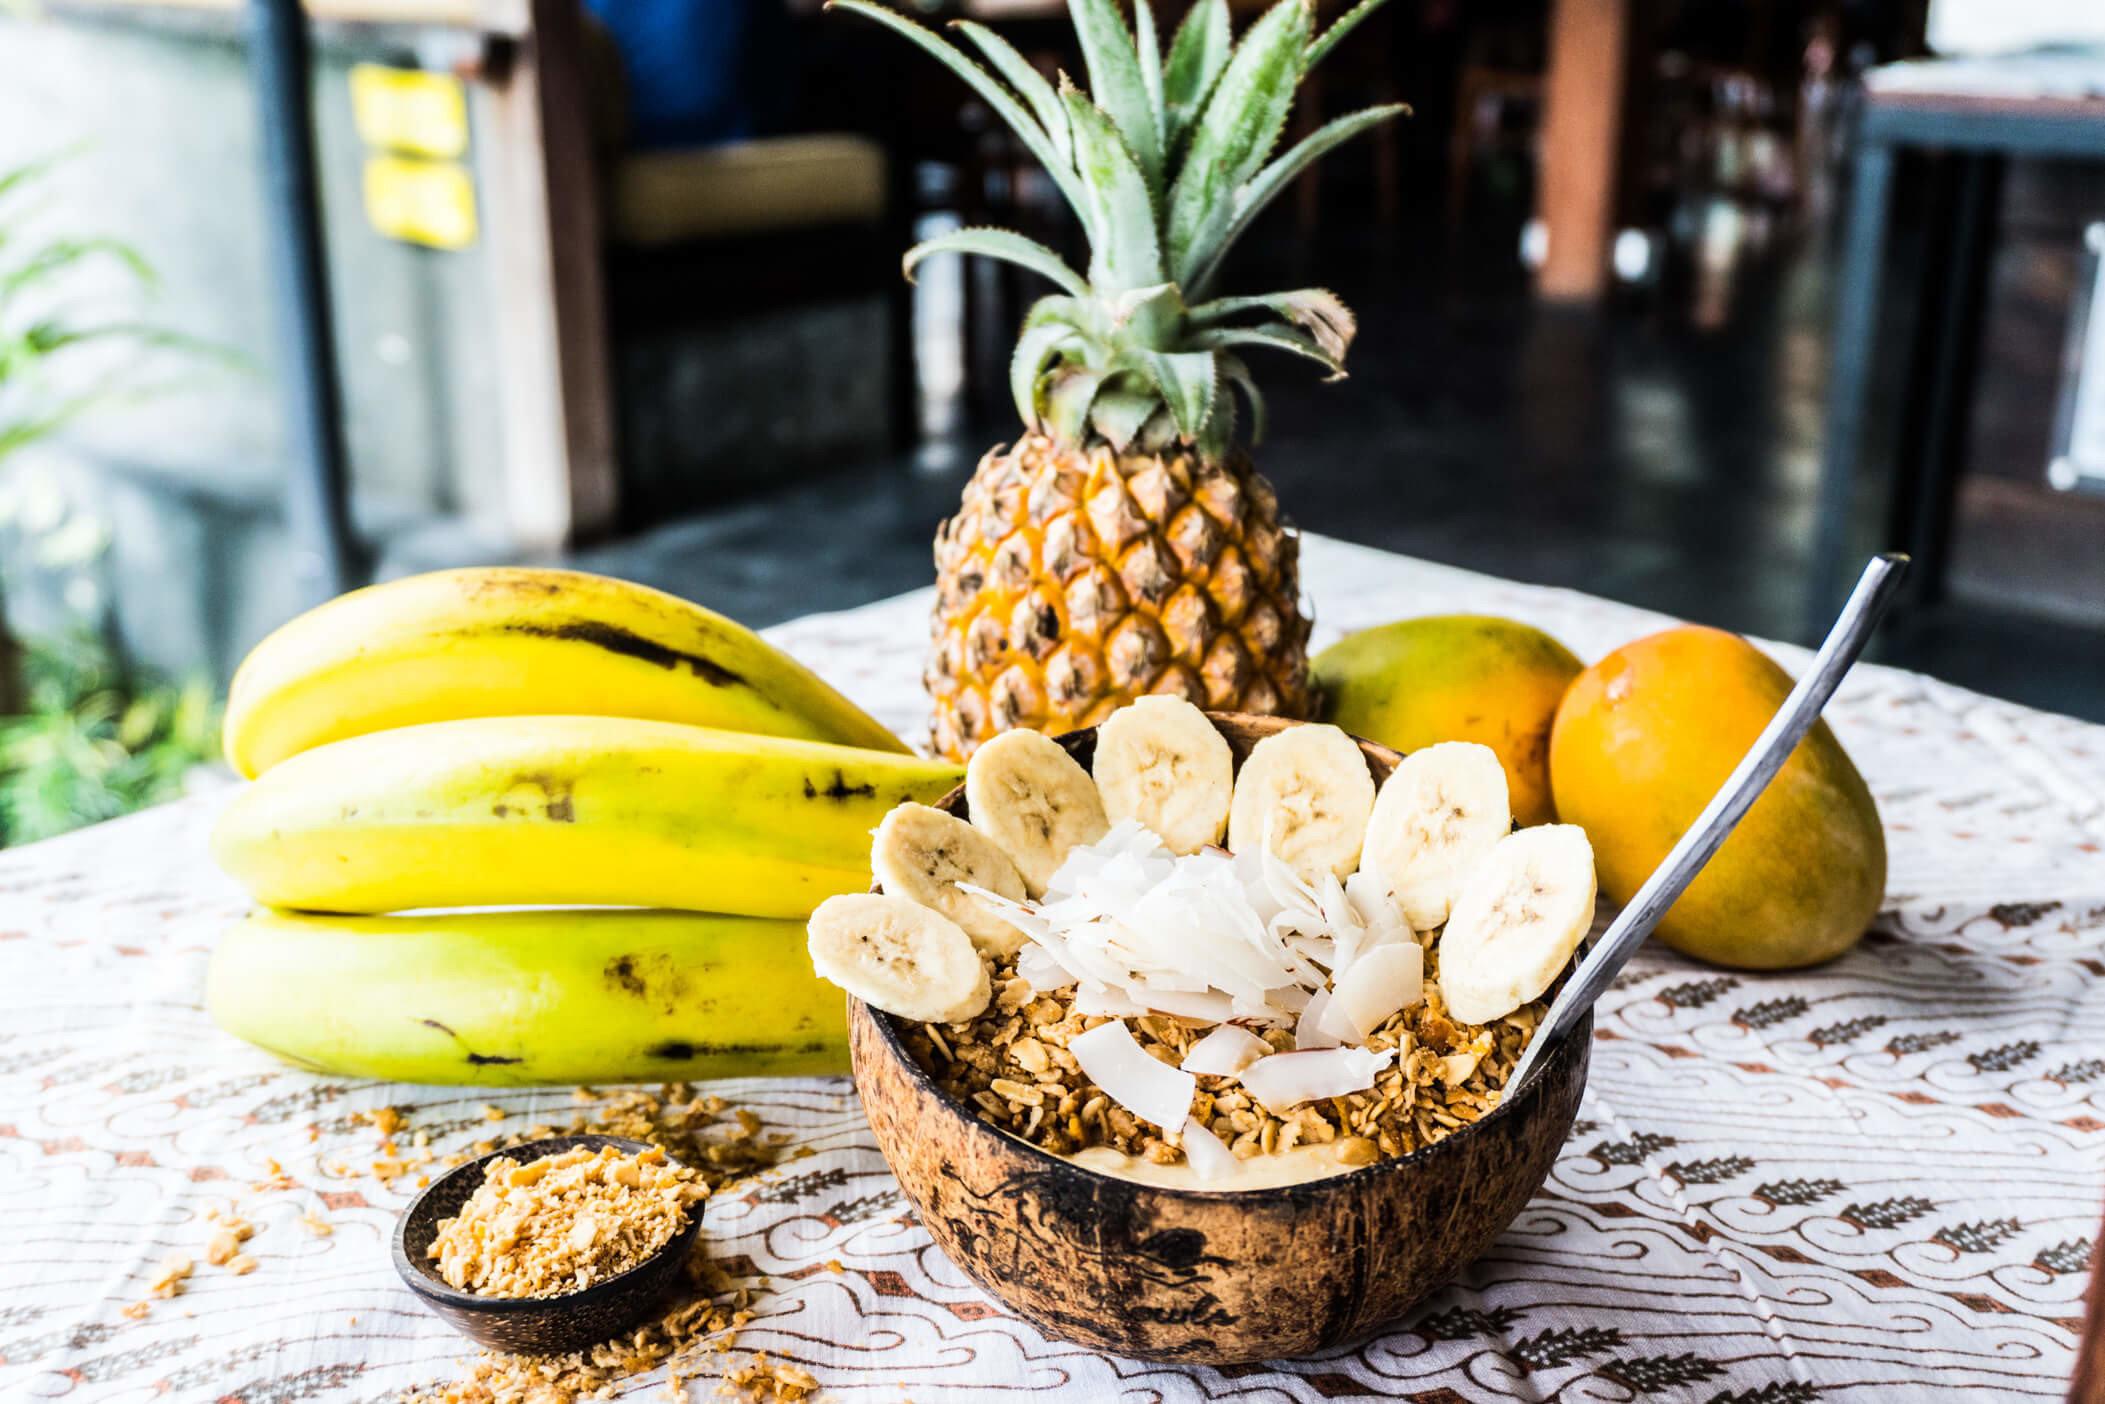 Influencers + Tastemakers Travel Shop Trip Ideas table ananas food fruit pineapple banana banana family produce vegetarian food vegetable bromeliaceae superfood fresh